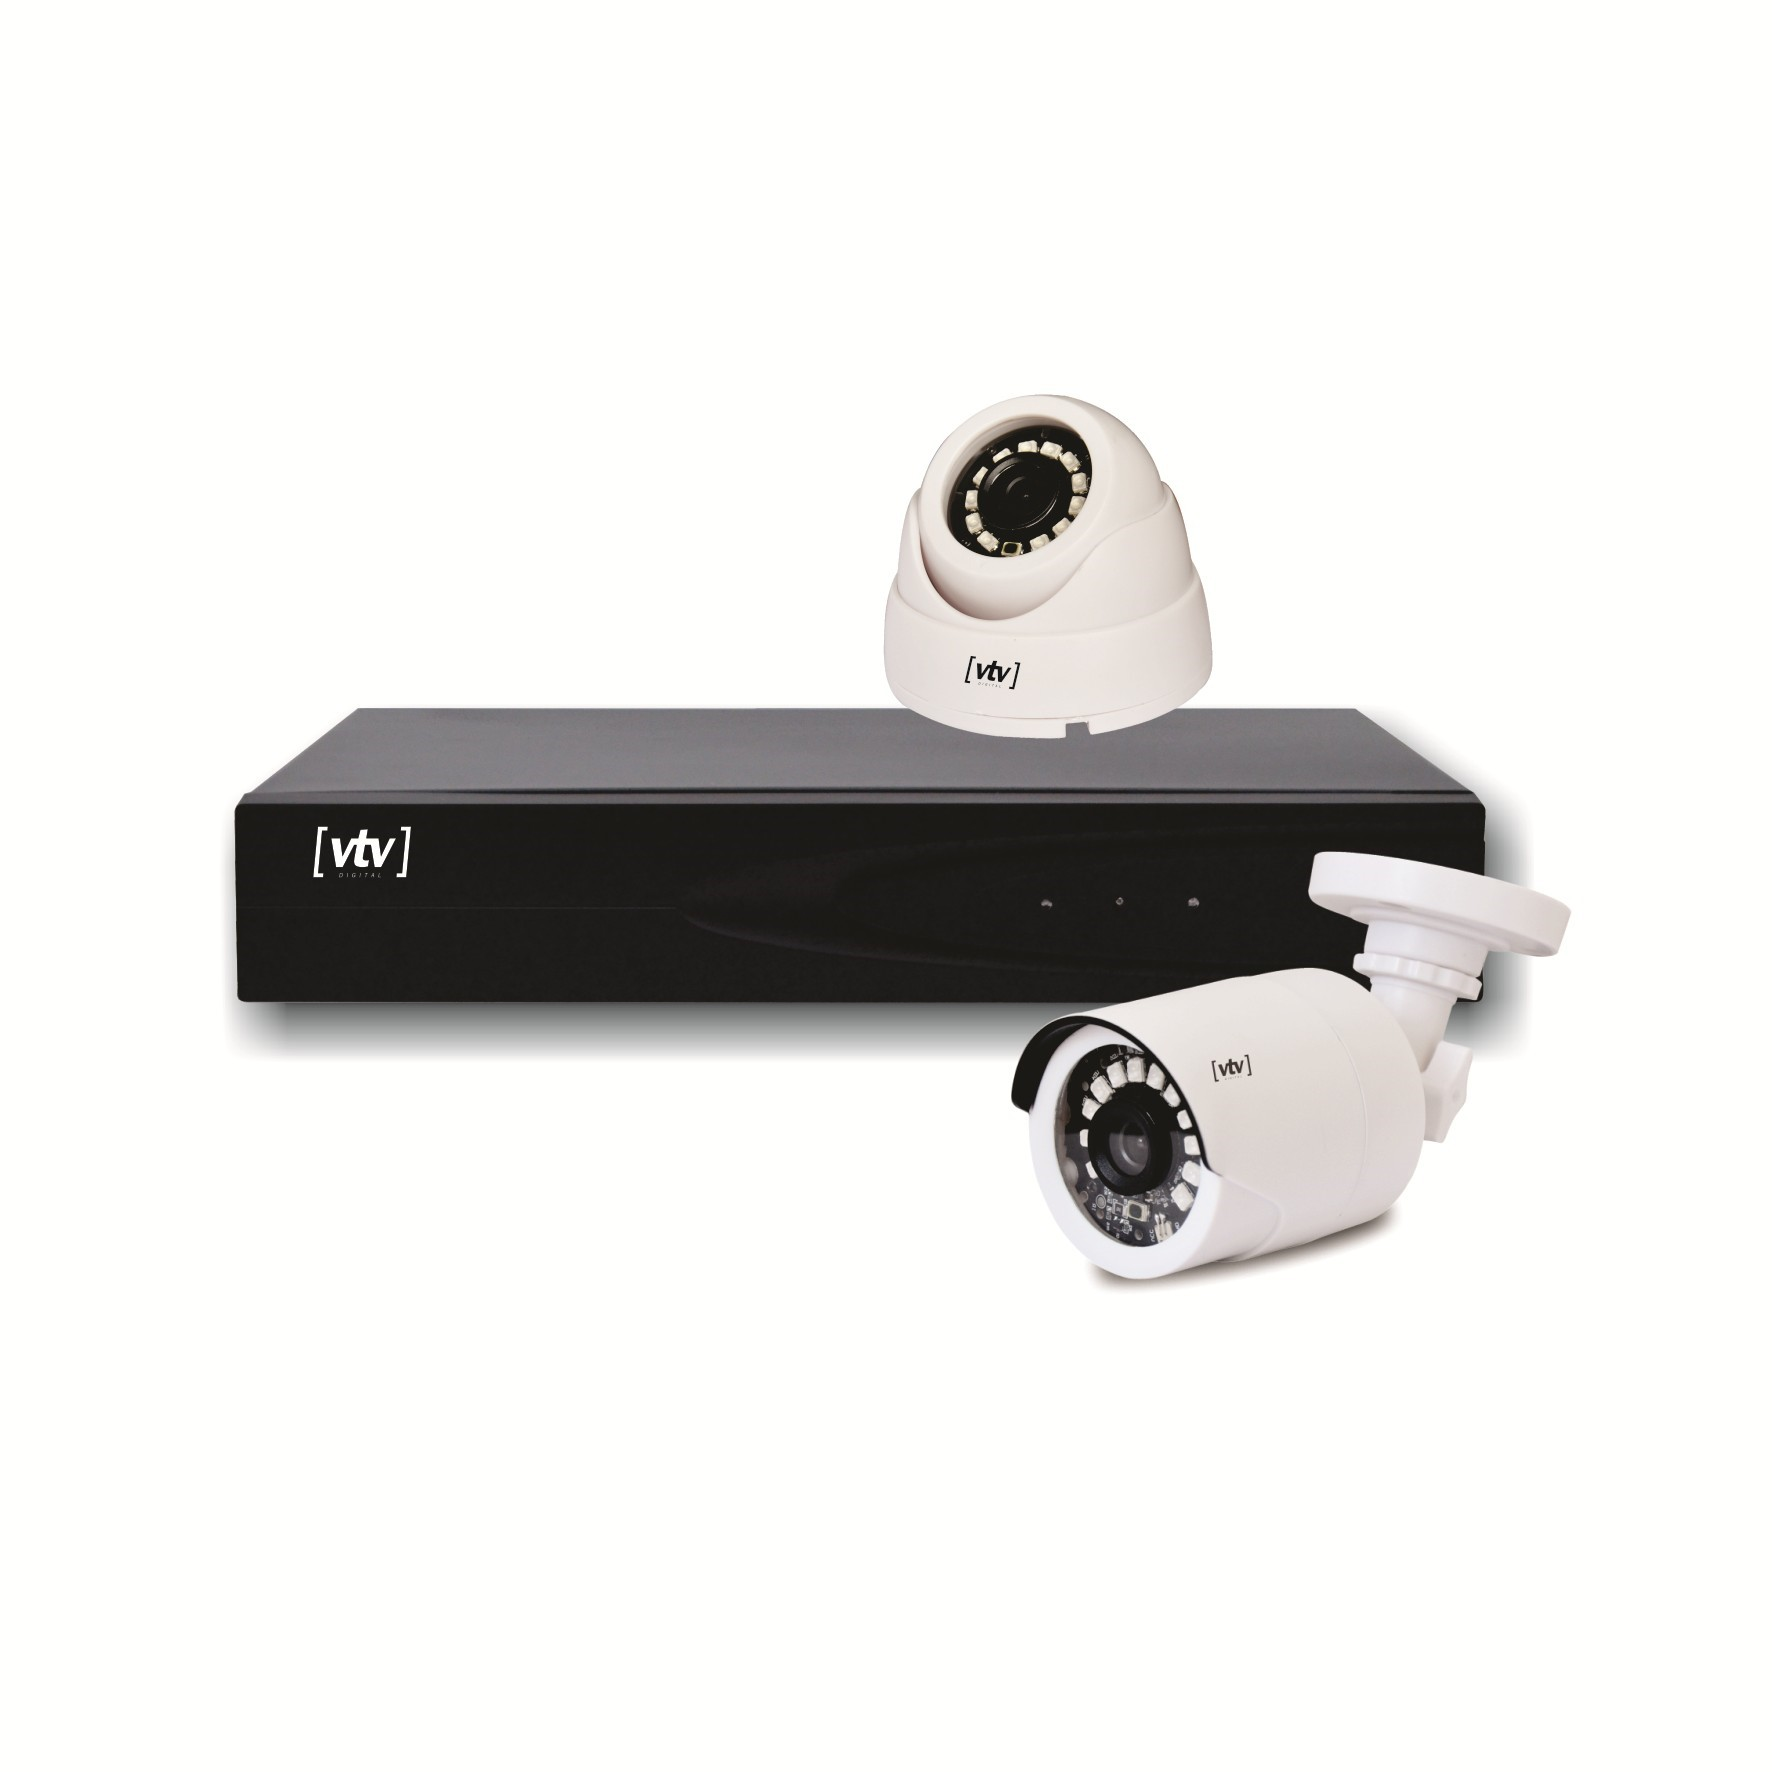 Kit 2 Cameras de Seguranca Full HD DVR 4 Canais - VTV